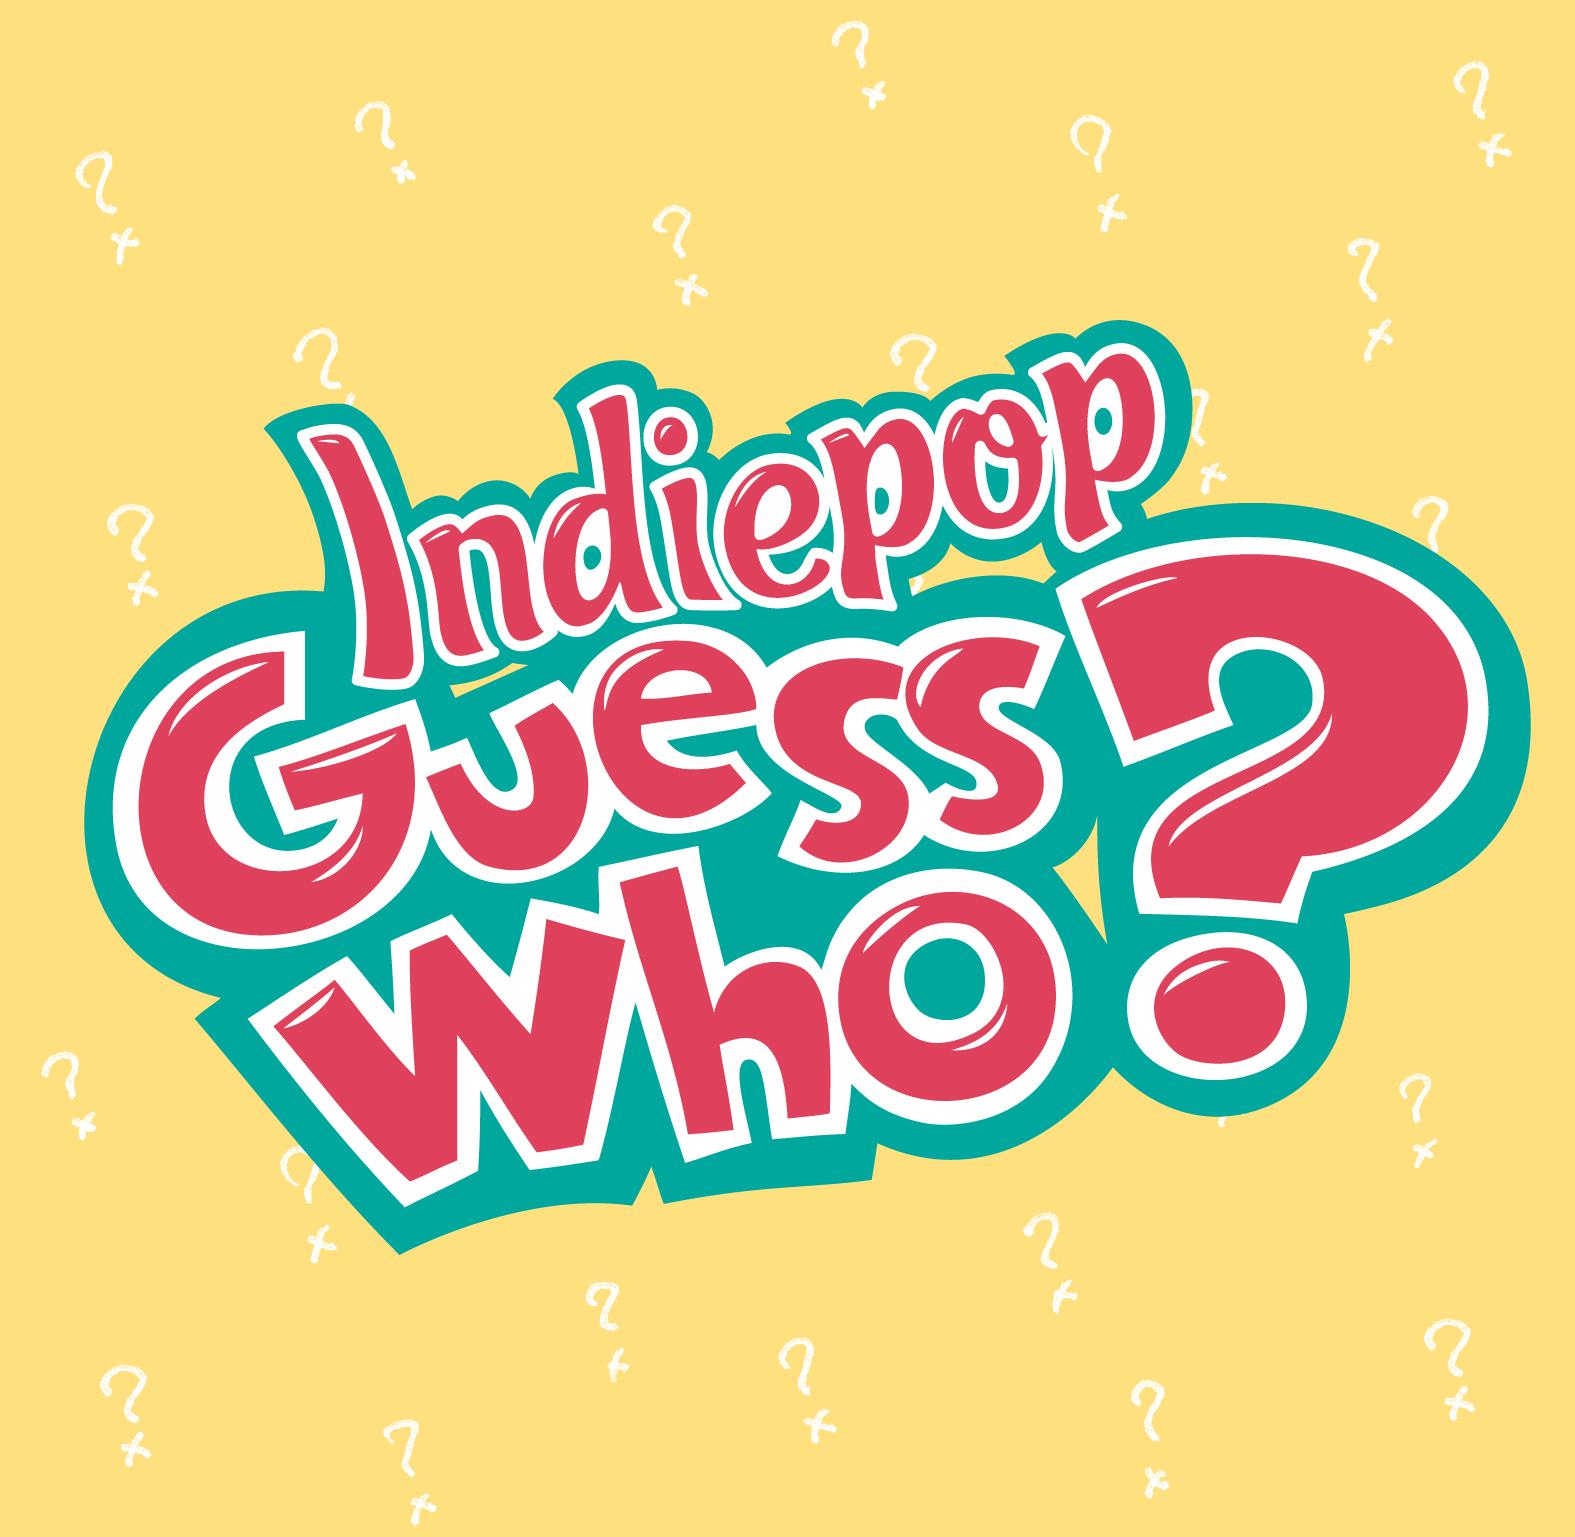 http://4.bp.blogspot.com/_M80IC9ZzdRE/TEDiafs49uI/AAAAAAAAAMA/aULqSuCSWME/s1600/indiepop-guesswho-logo.jpg